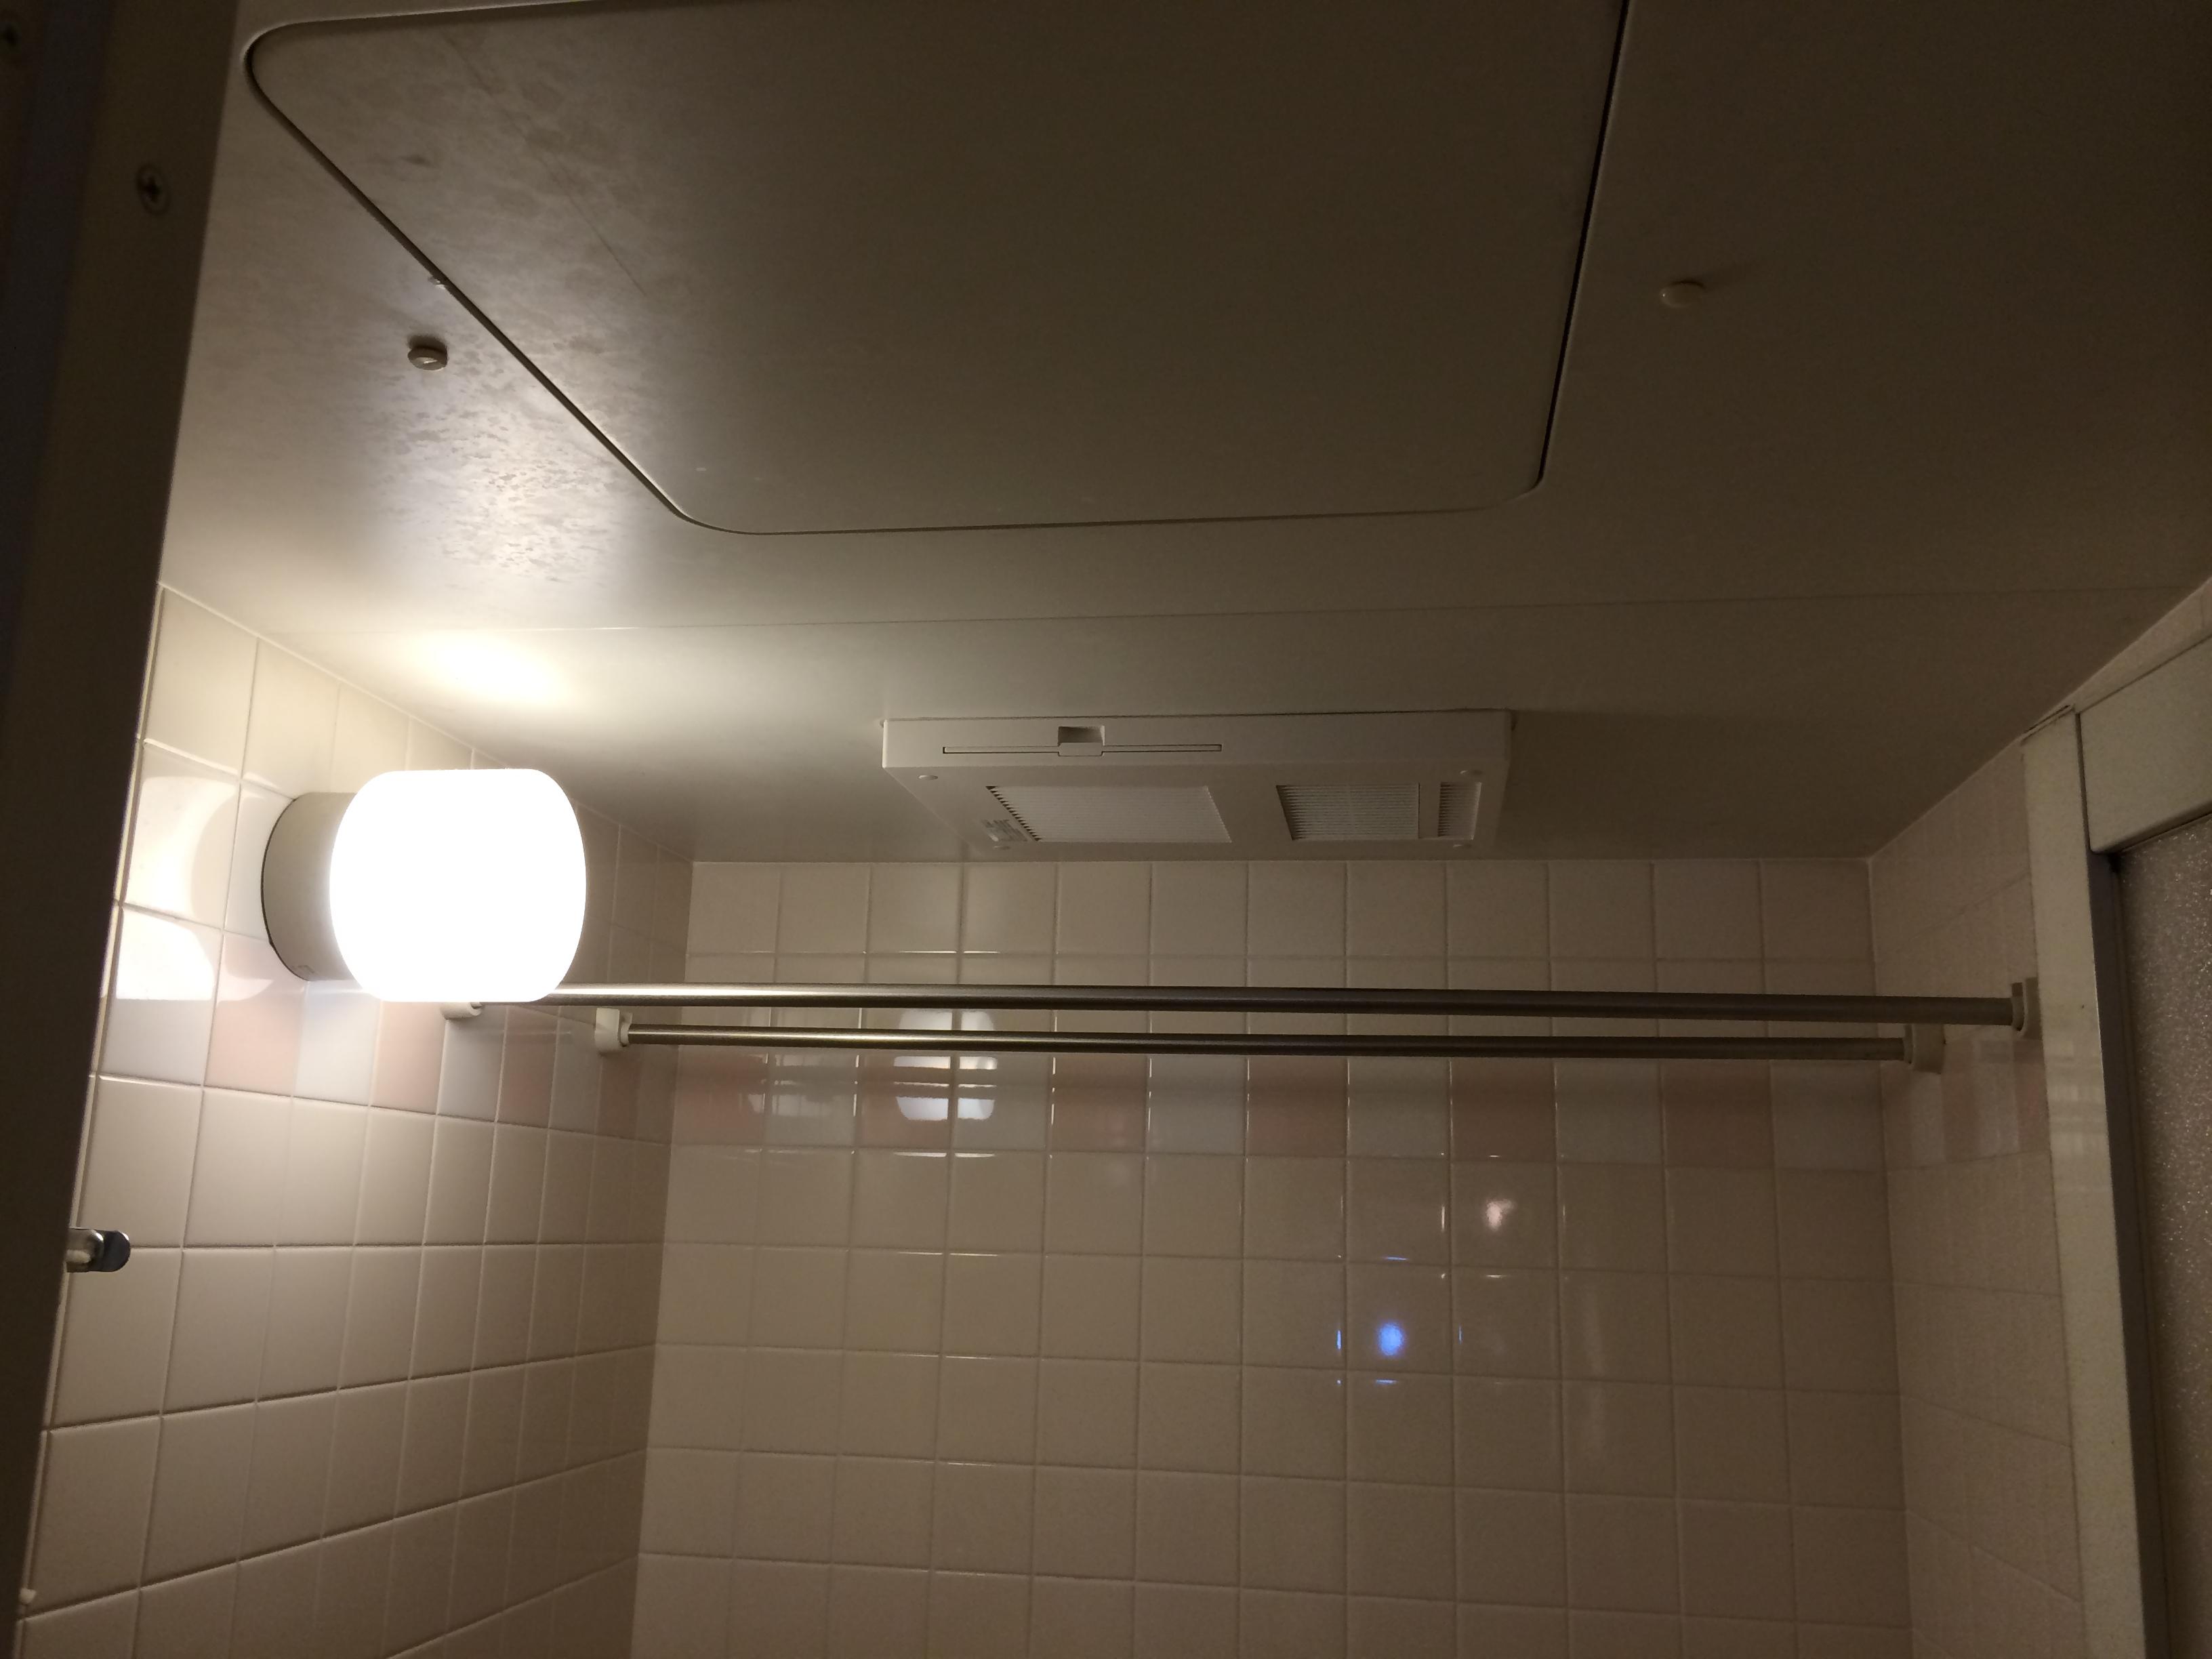 MAX 浴室換気乾燥機 BS-151H-CX 交換工事